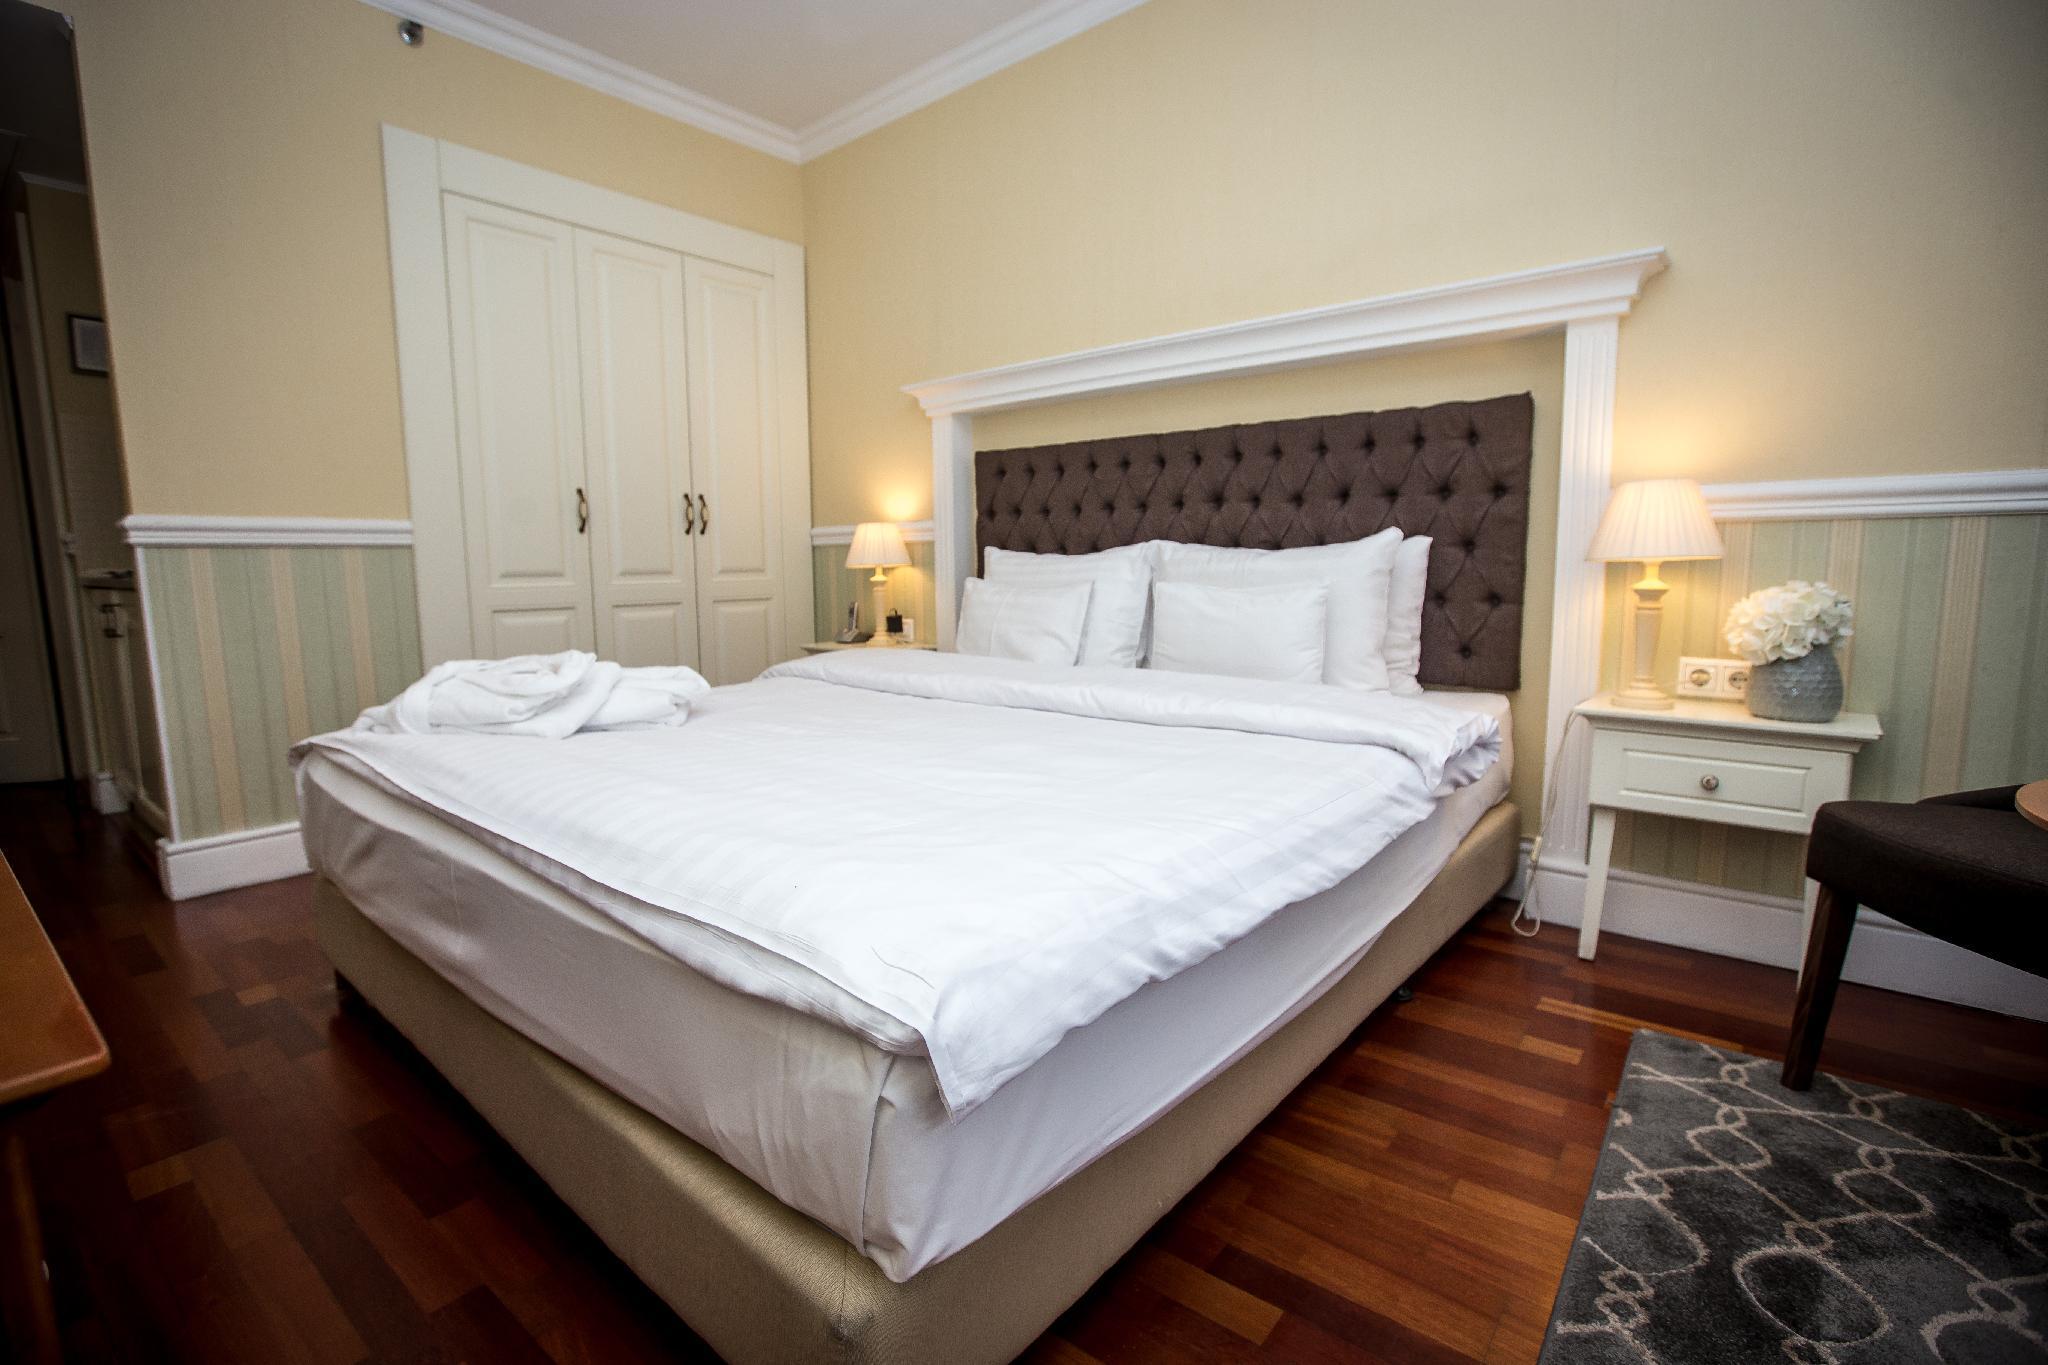 Queen S Court Hotel Residence 07 Erzsebetvaros Budapest